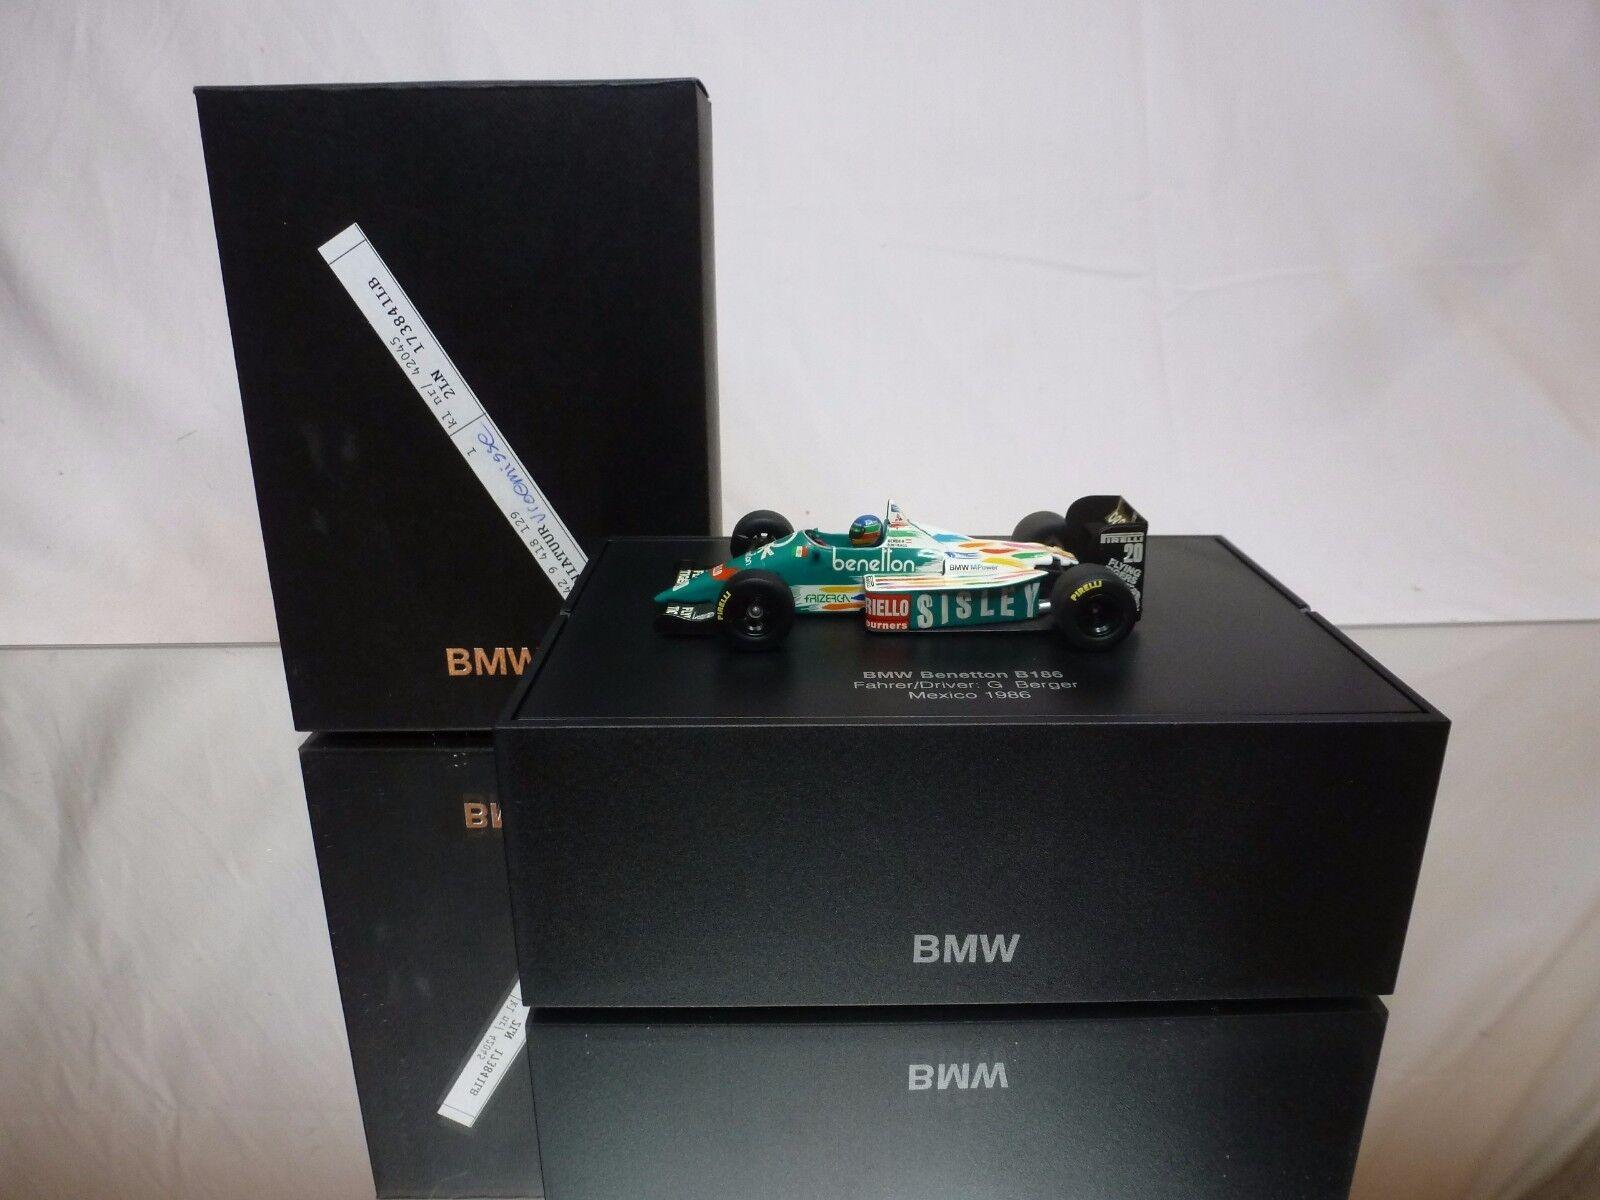 MINICHAMPS BMW BENETTON 186 - F1 SISLEY 1 43 - EXCELLENT IN DEALER BOX